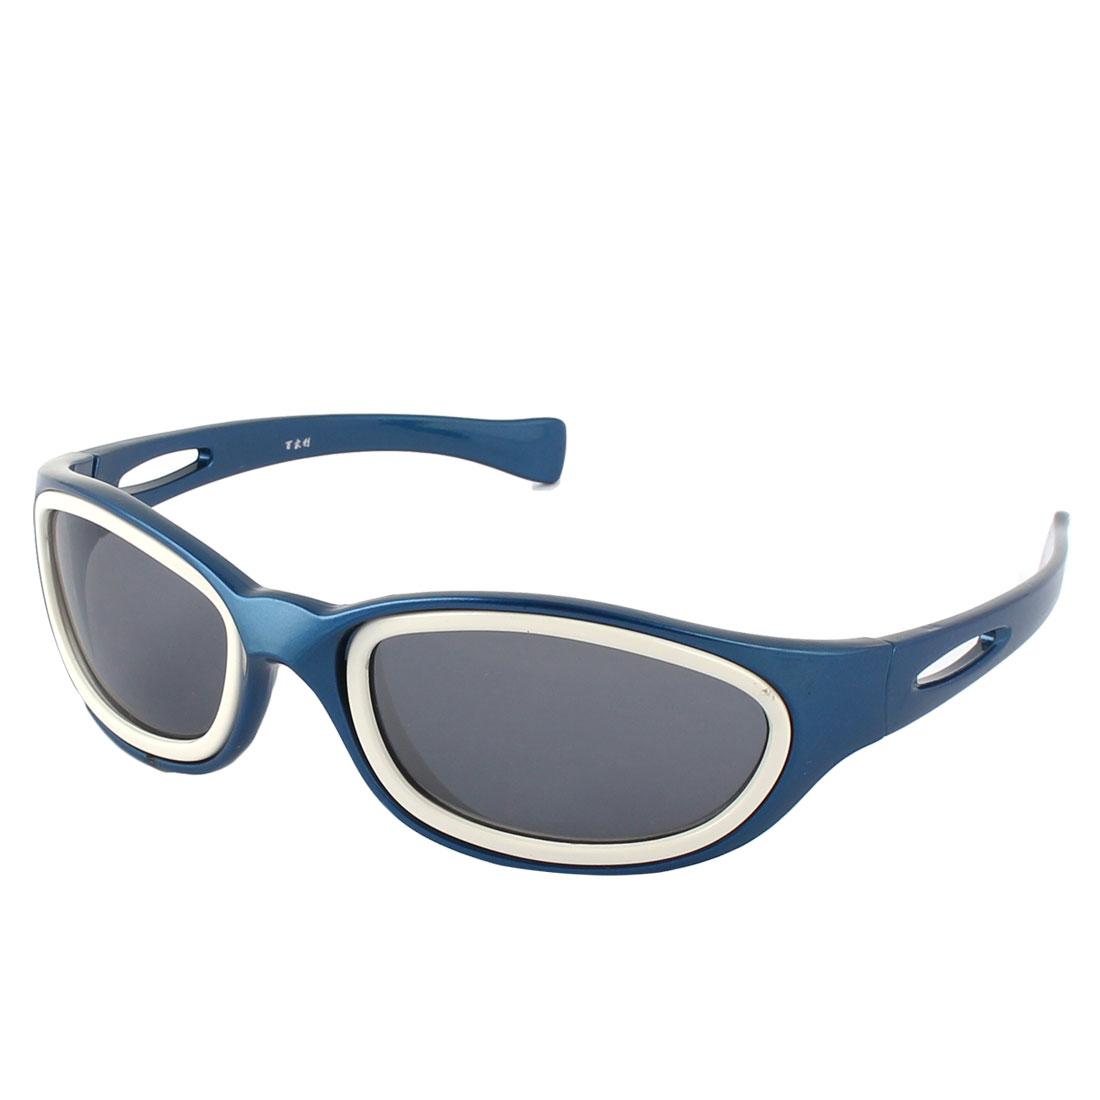 Unisex Plastic Rectangle Full Rim Flame Sun Shield Lens Sports Sunglass Blue